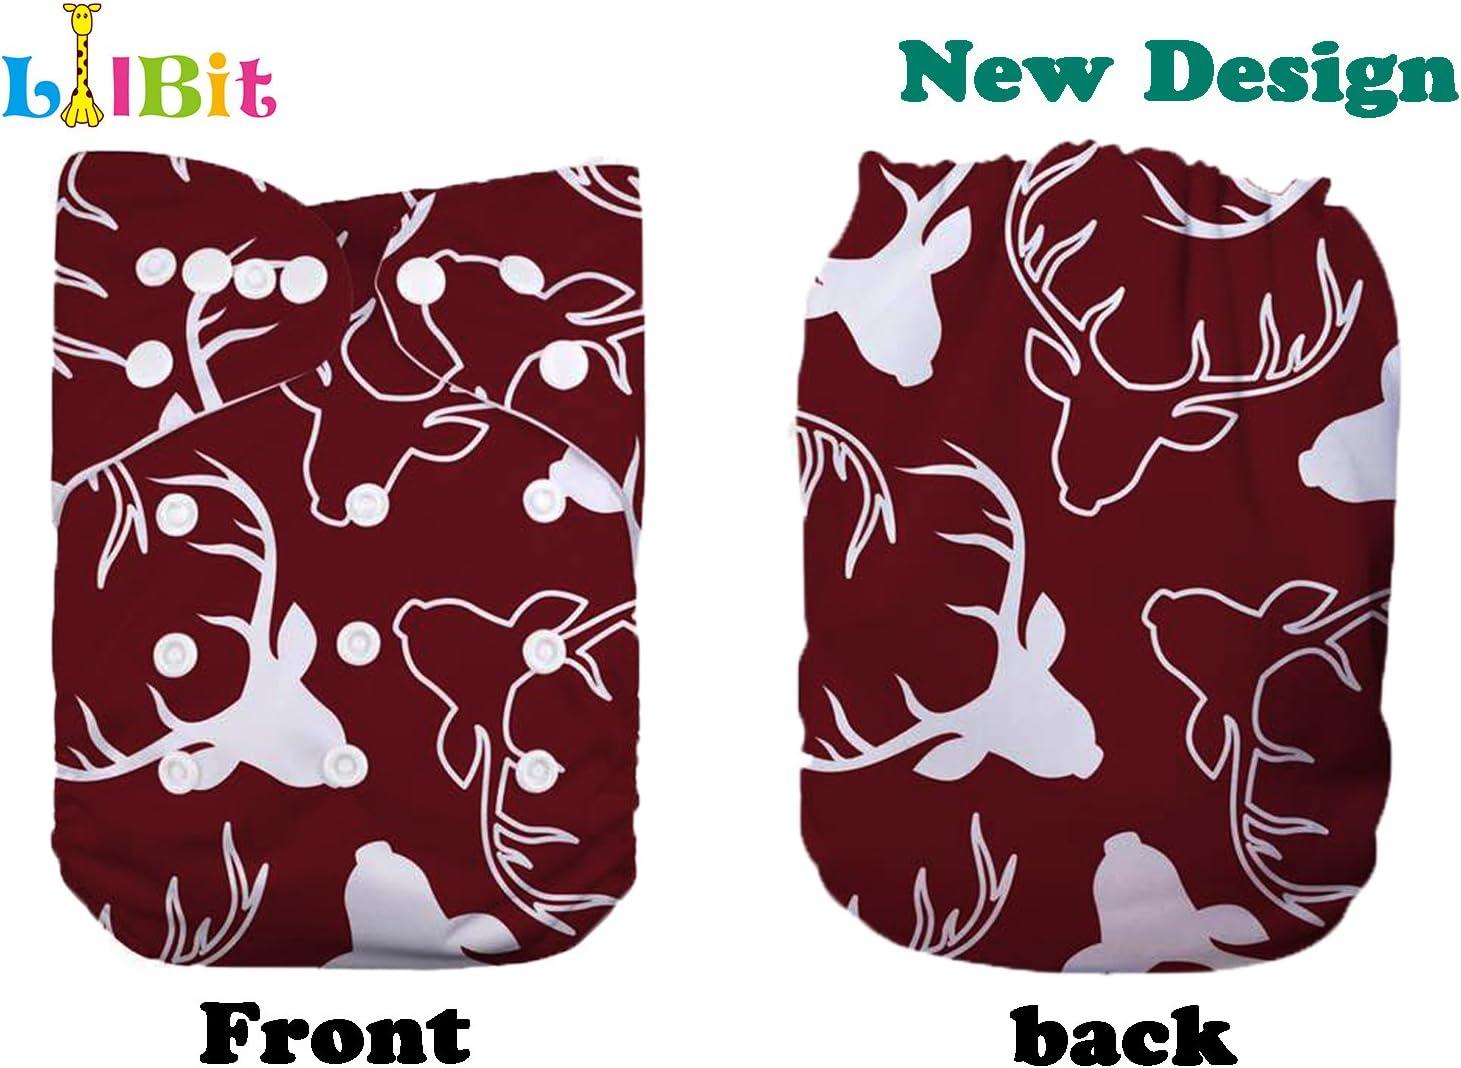 LilBit Baby 6pcs Inserts and 6 pcs Washable Adjustable Pocket One Size Cloth Diapers LBTZH09-UK